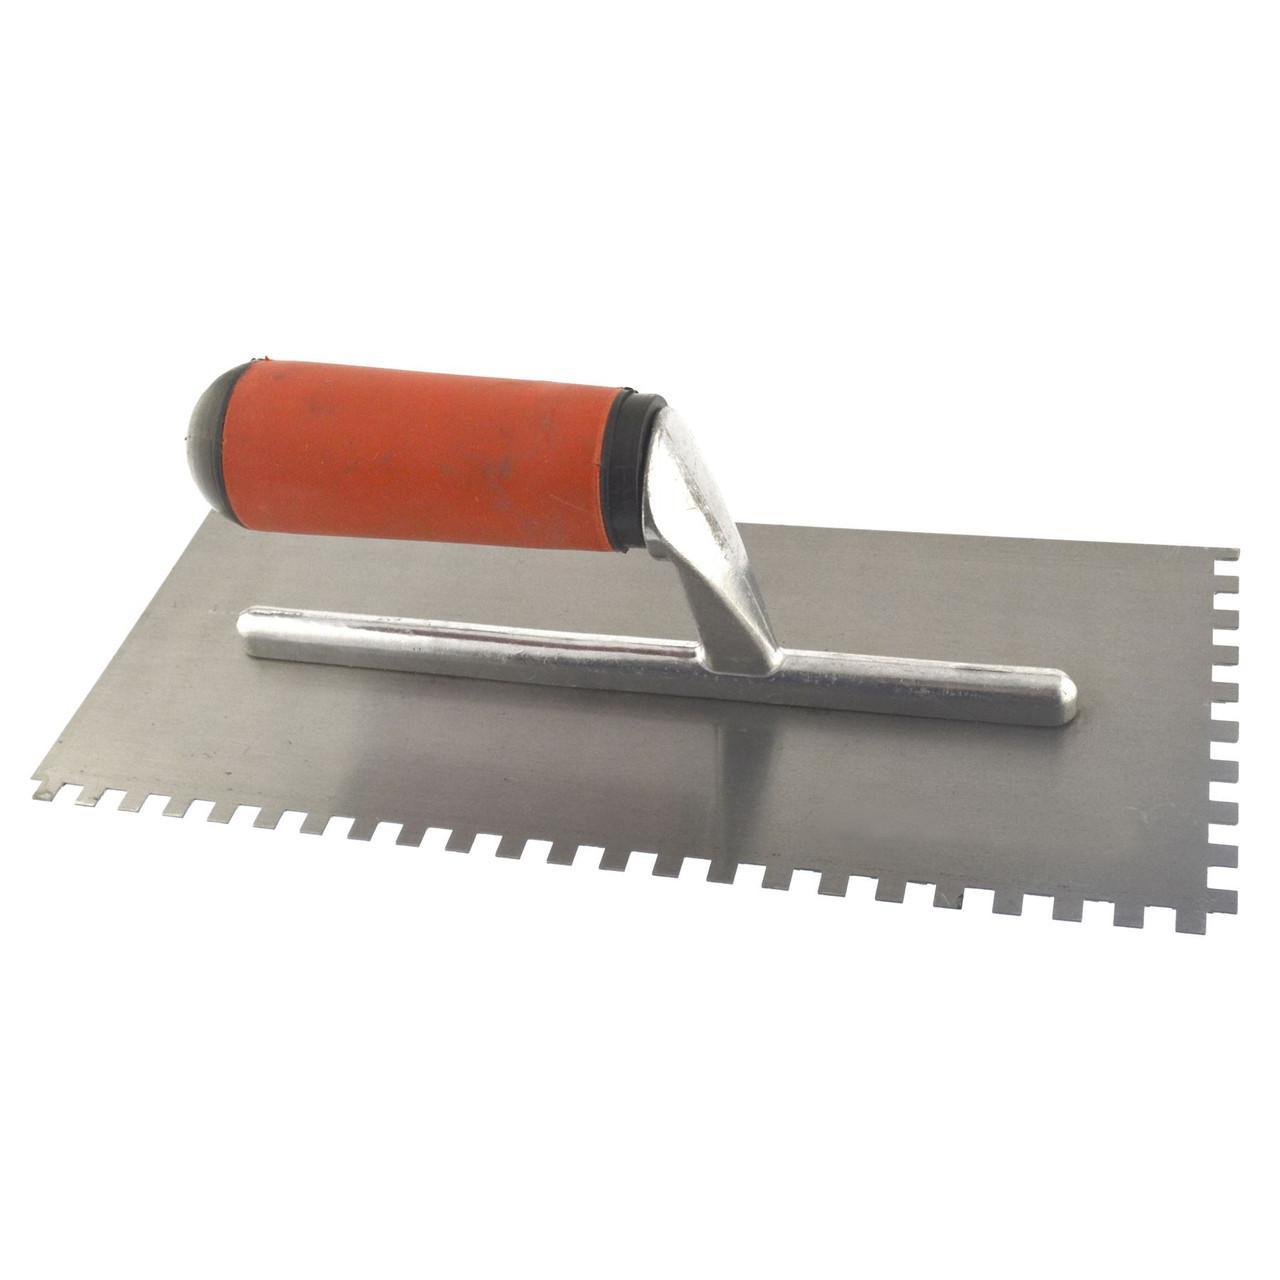 280mm Soft Grip Plastering Trowel 280mm